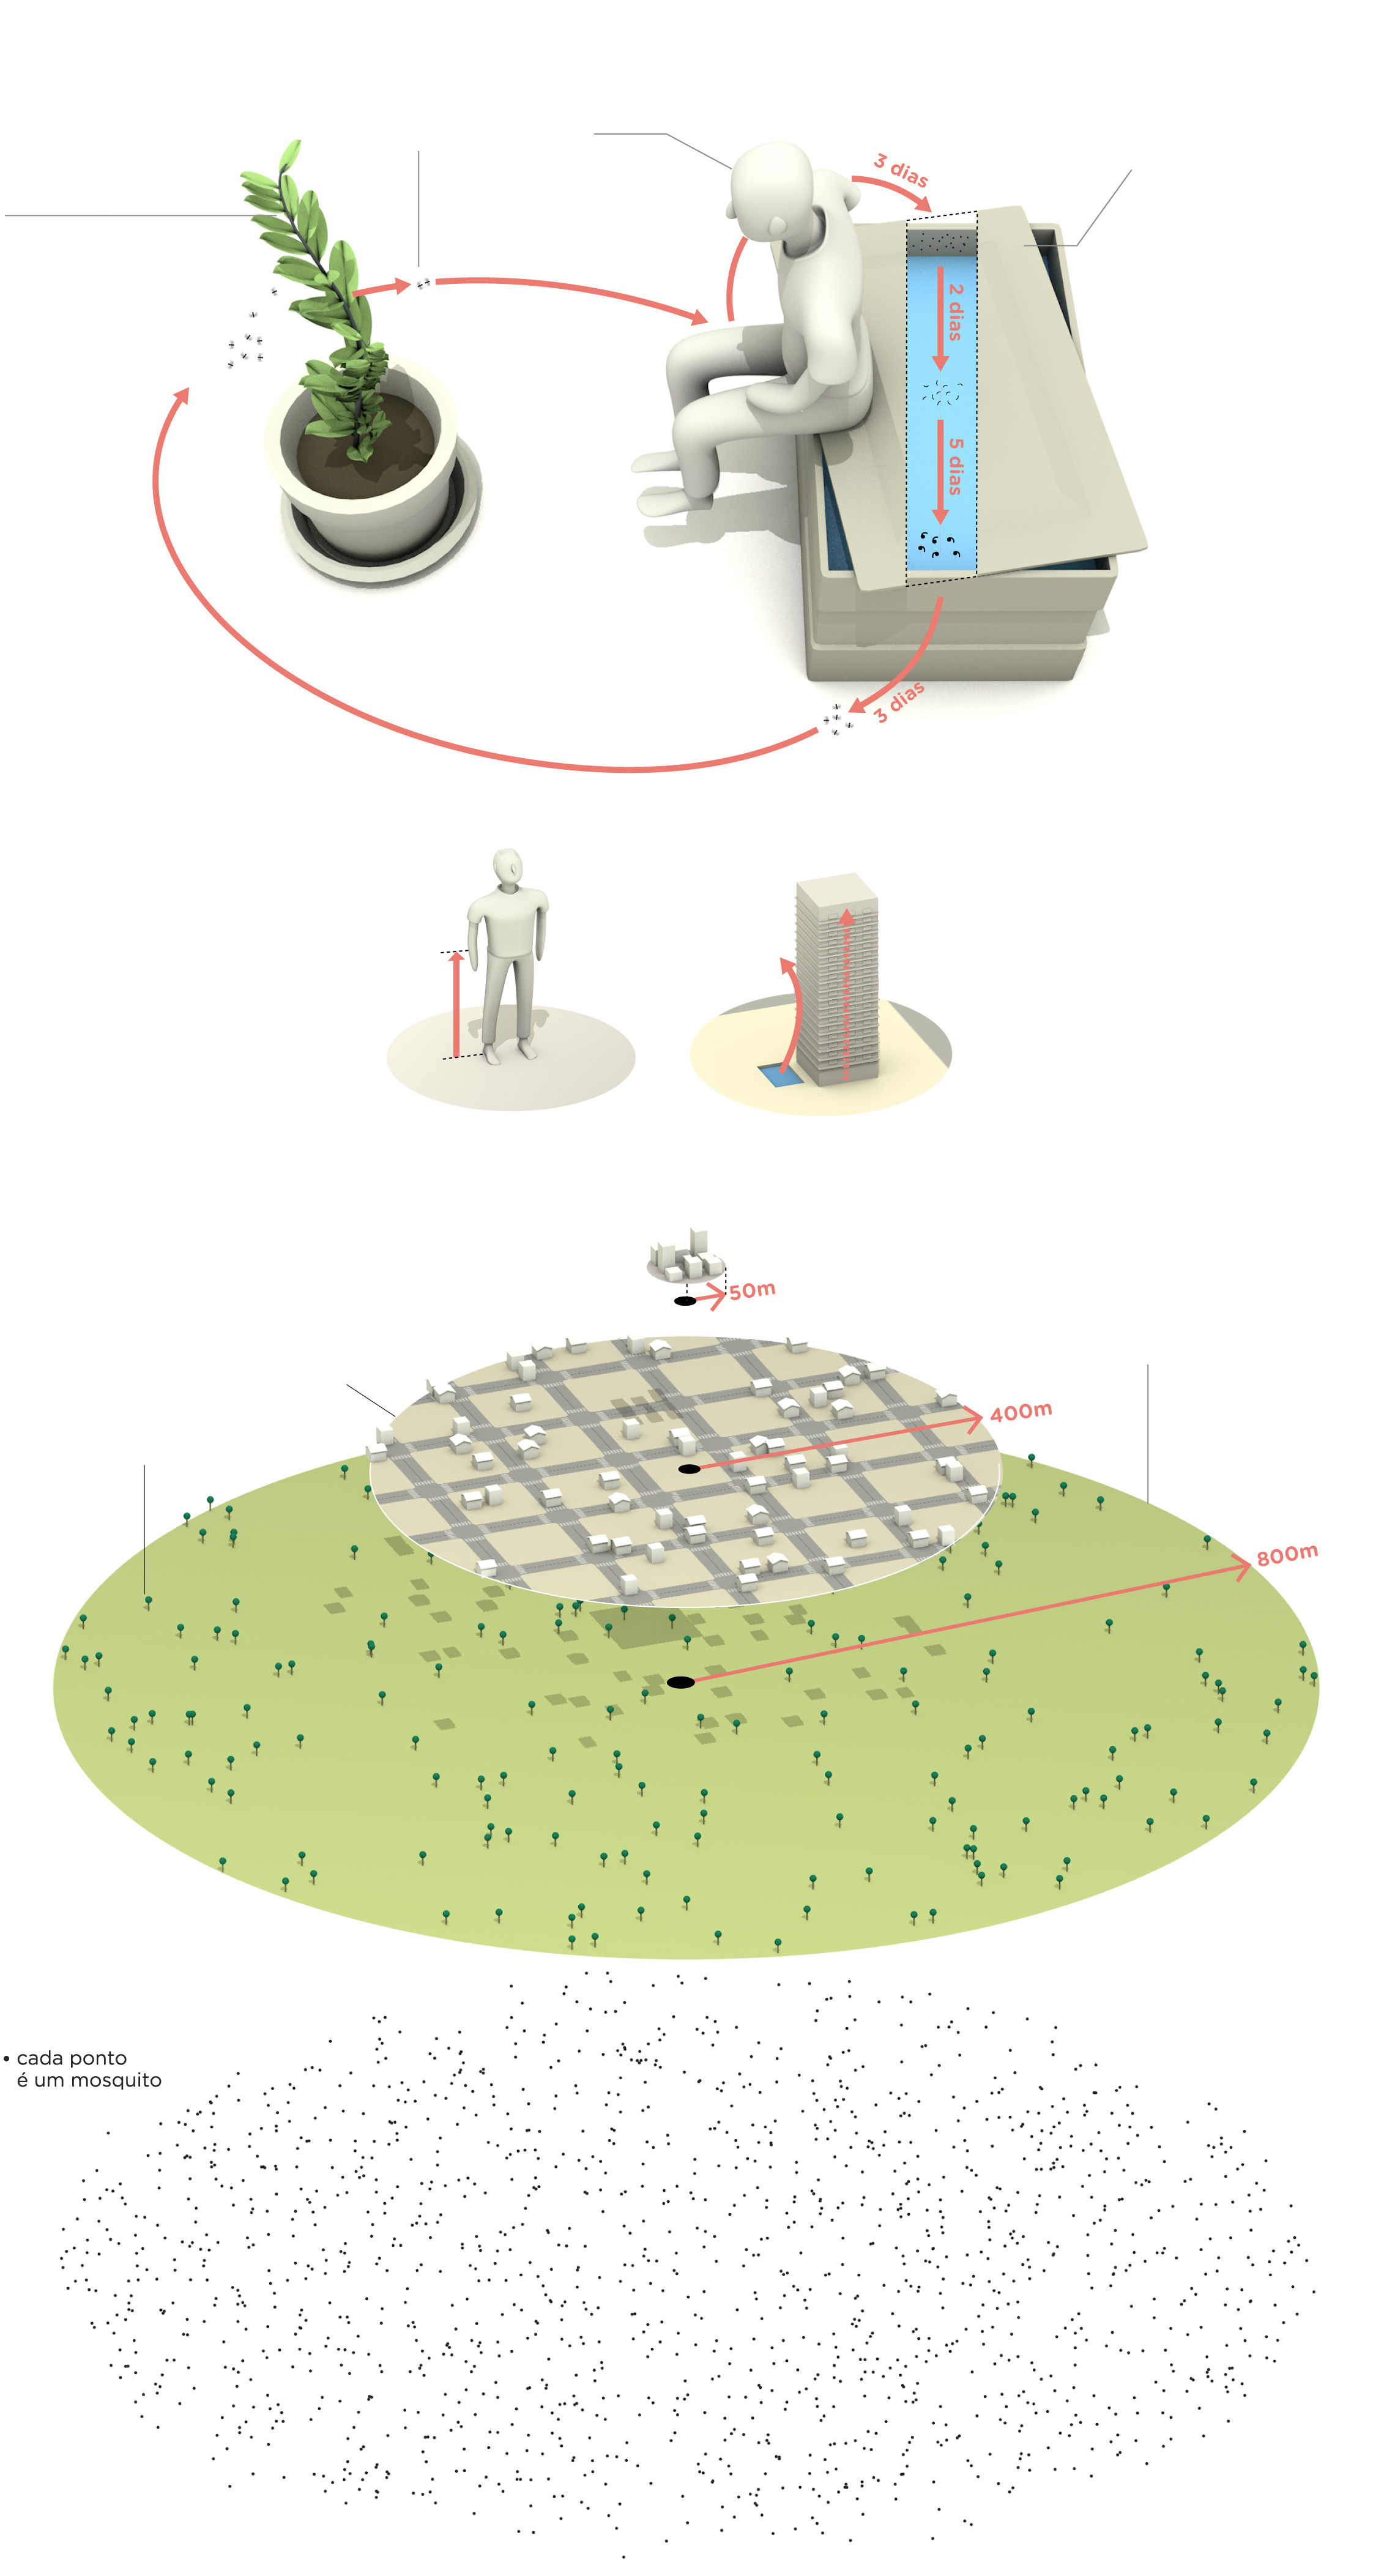 ciclo de vida mosquito aedes aegypti